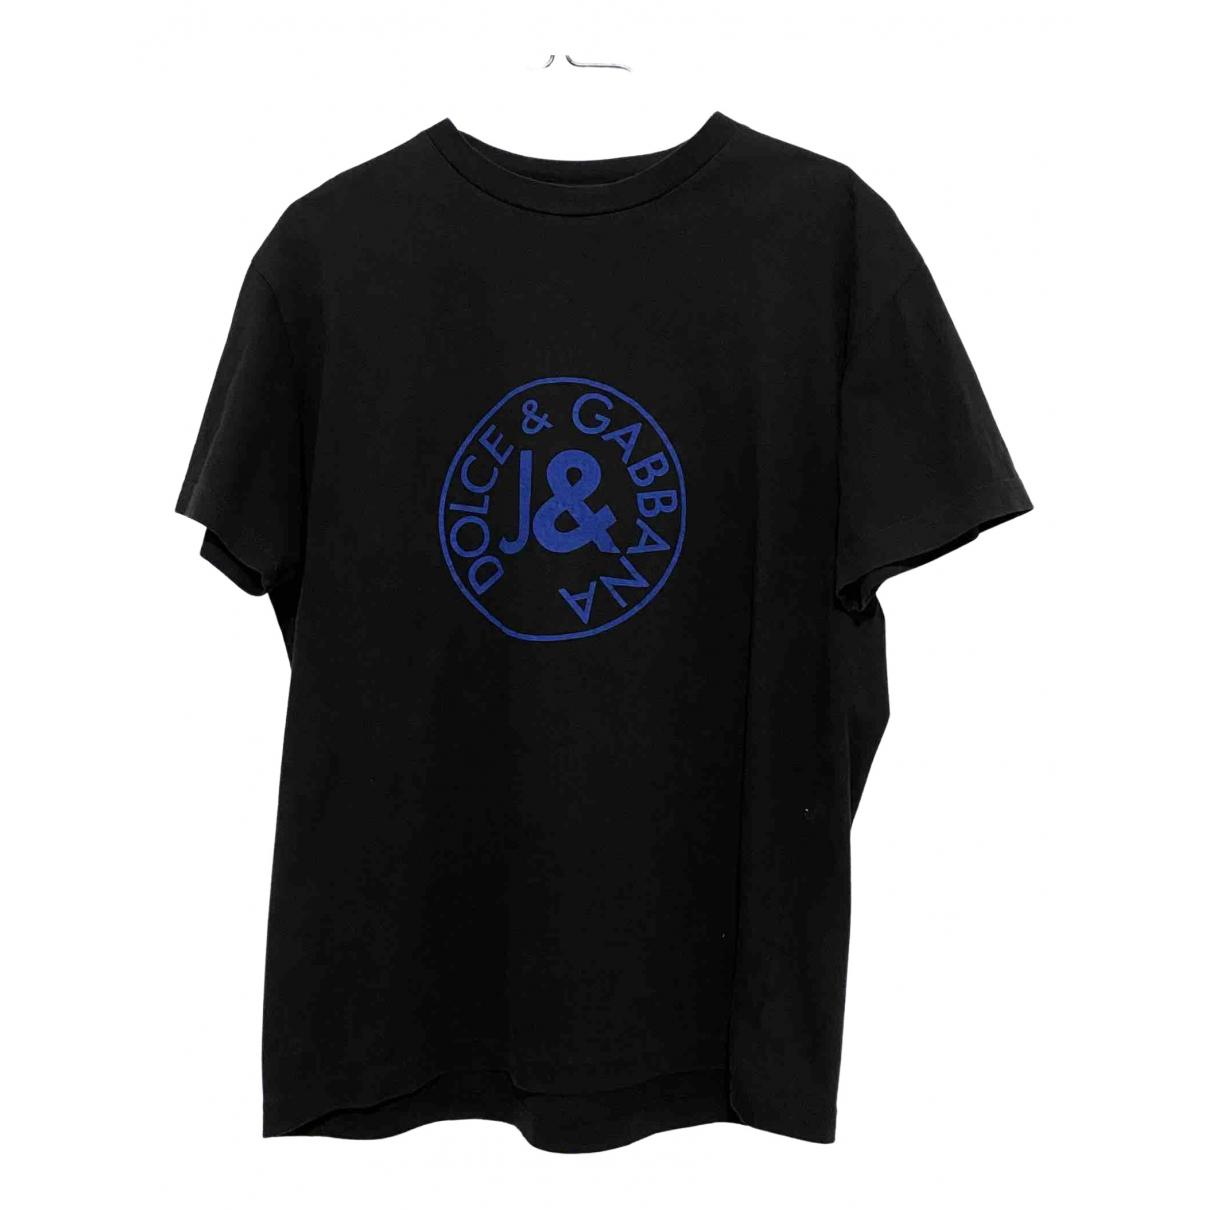 D&g \N Black Cotton T-shirts for Men L International